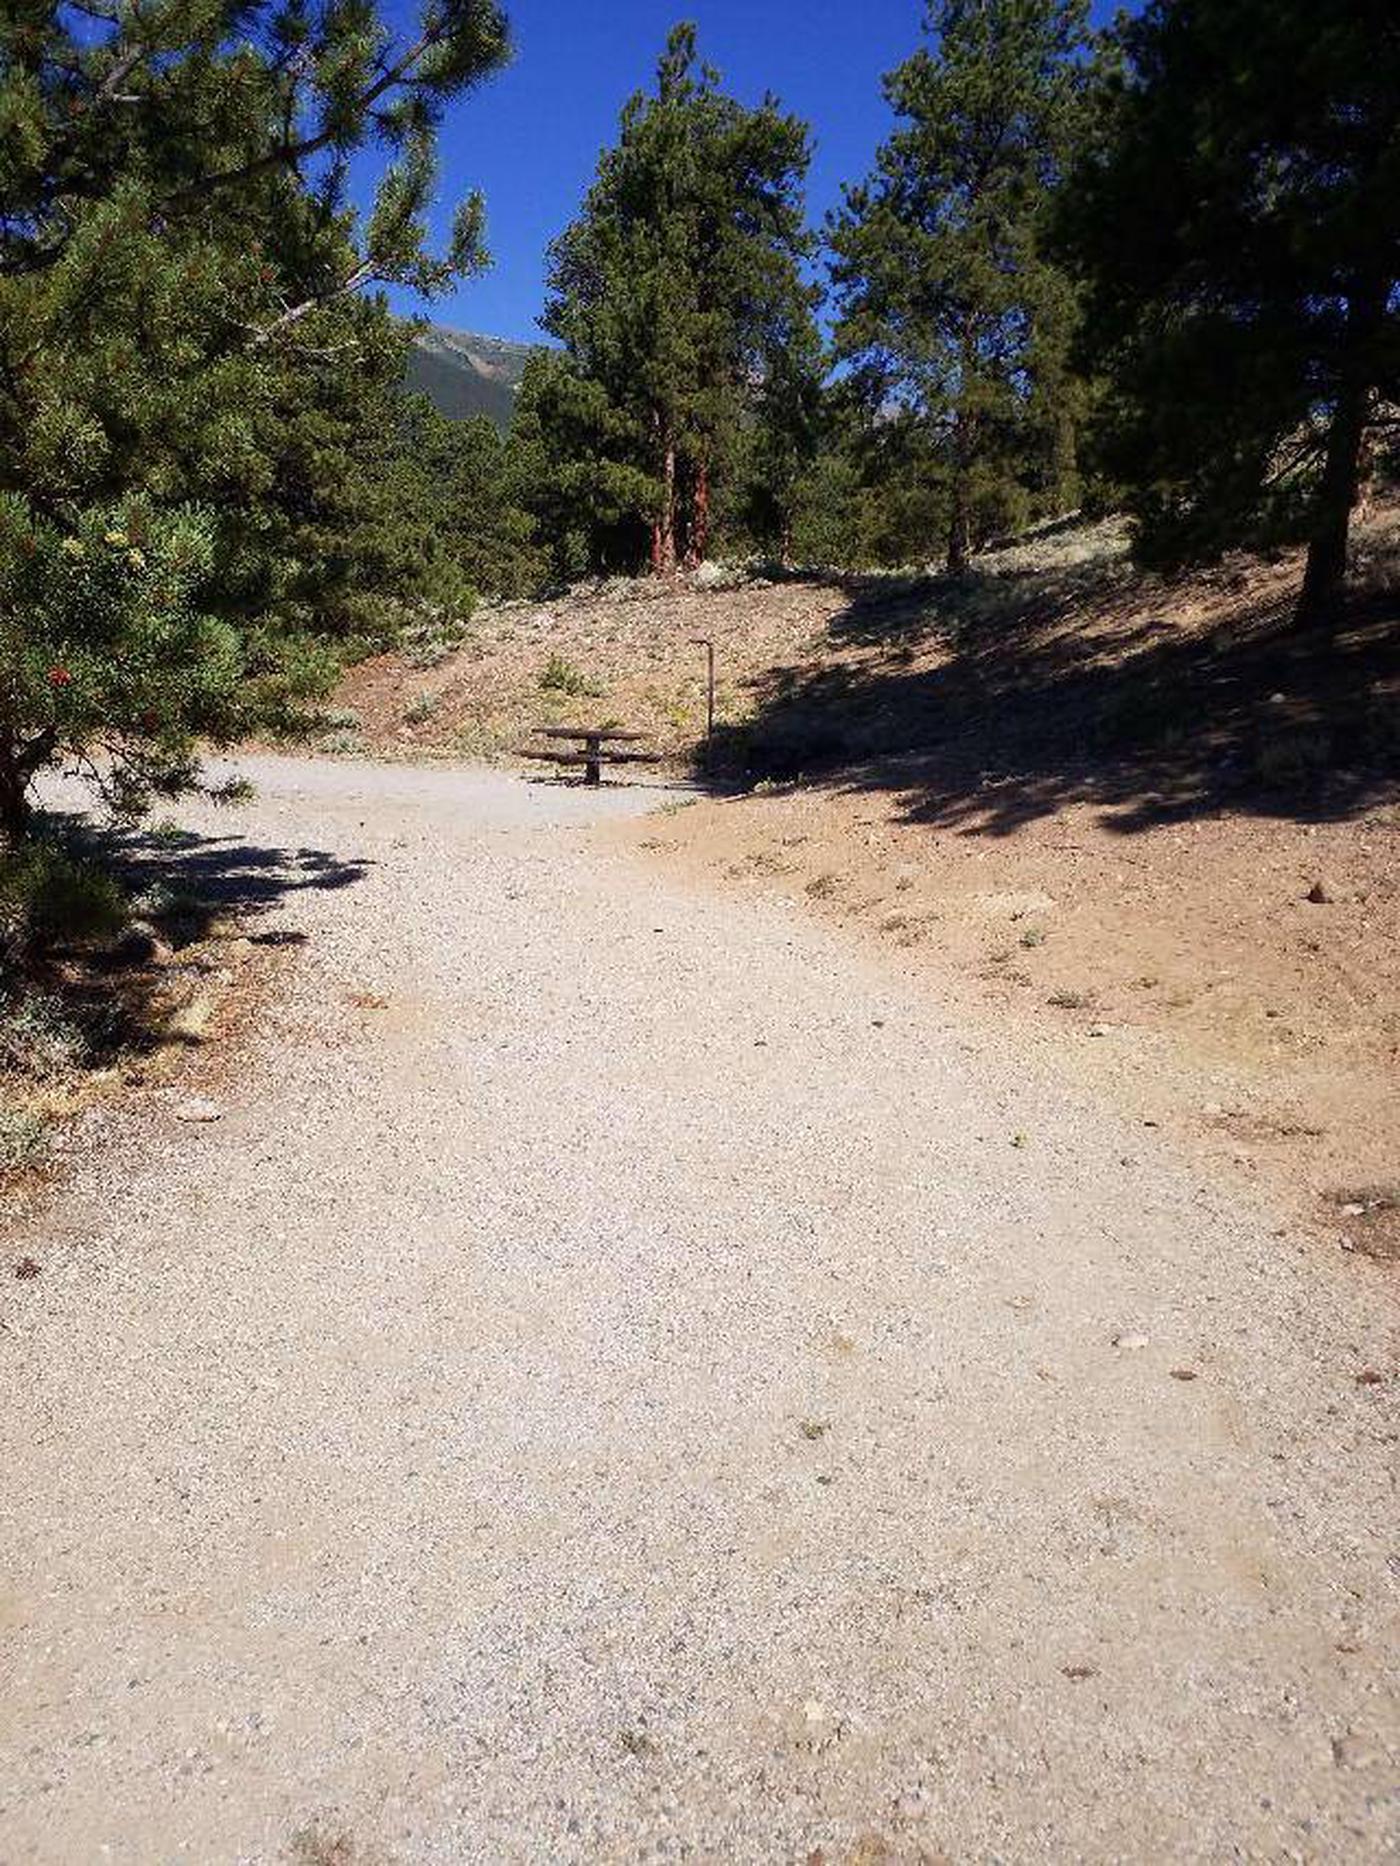 White Star Campground, site 23 parking